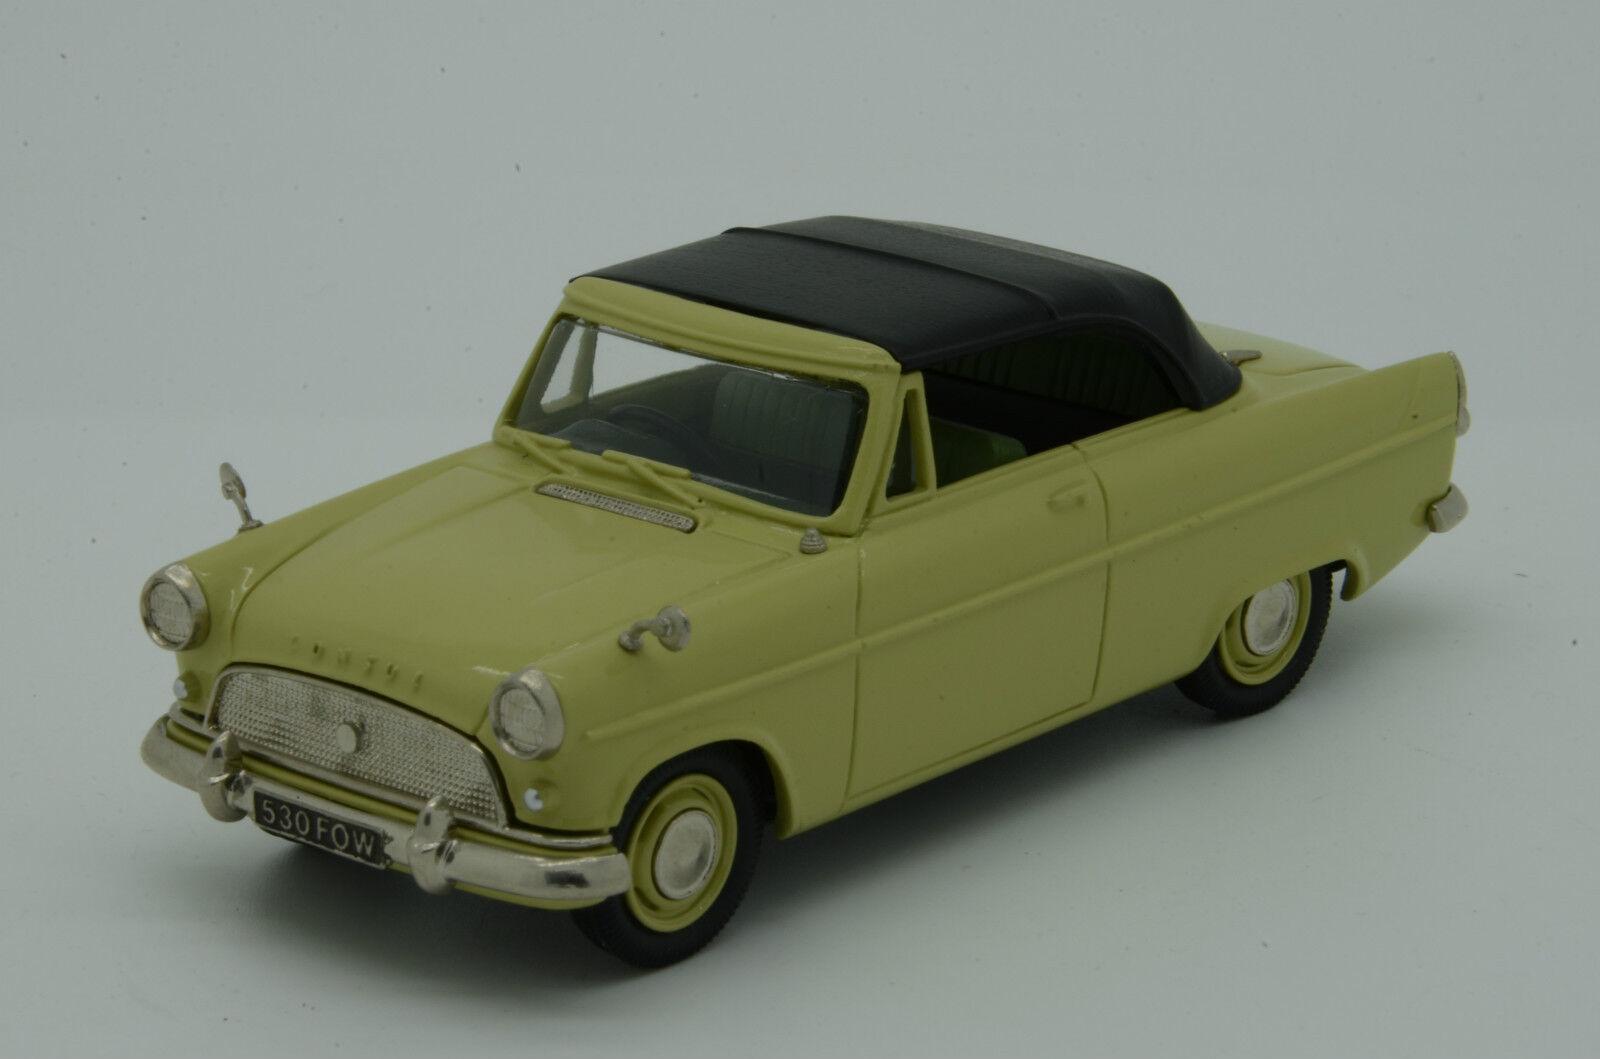 Raro Ford Consul Mkii Converdeible 1962 Lansdowne Ldm. 23 por Brooklin 1 43